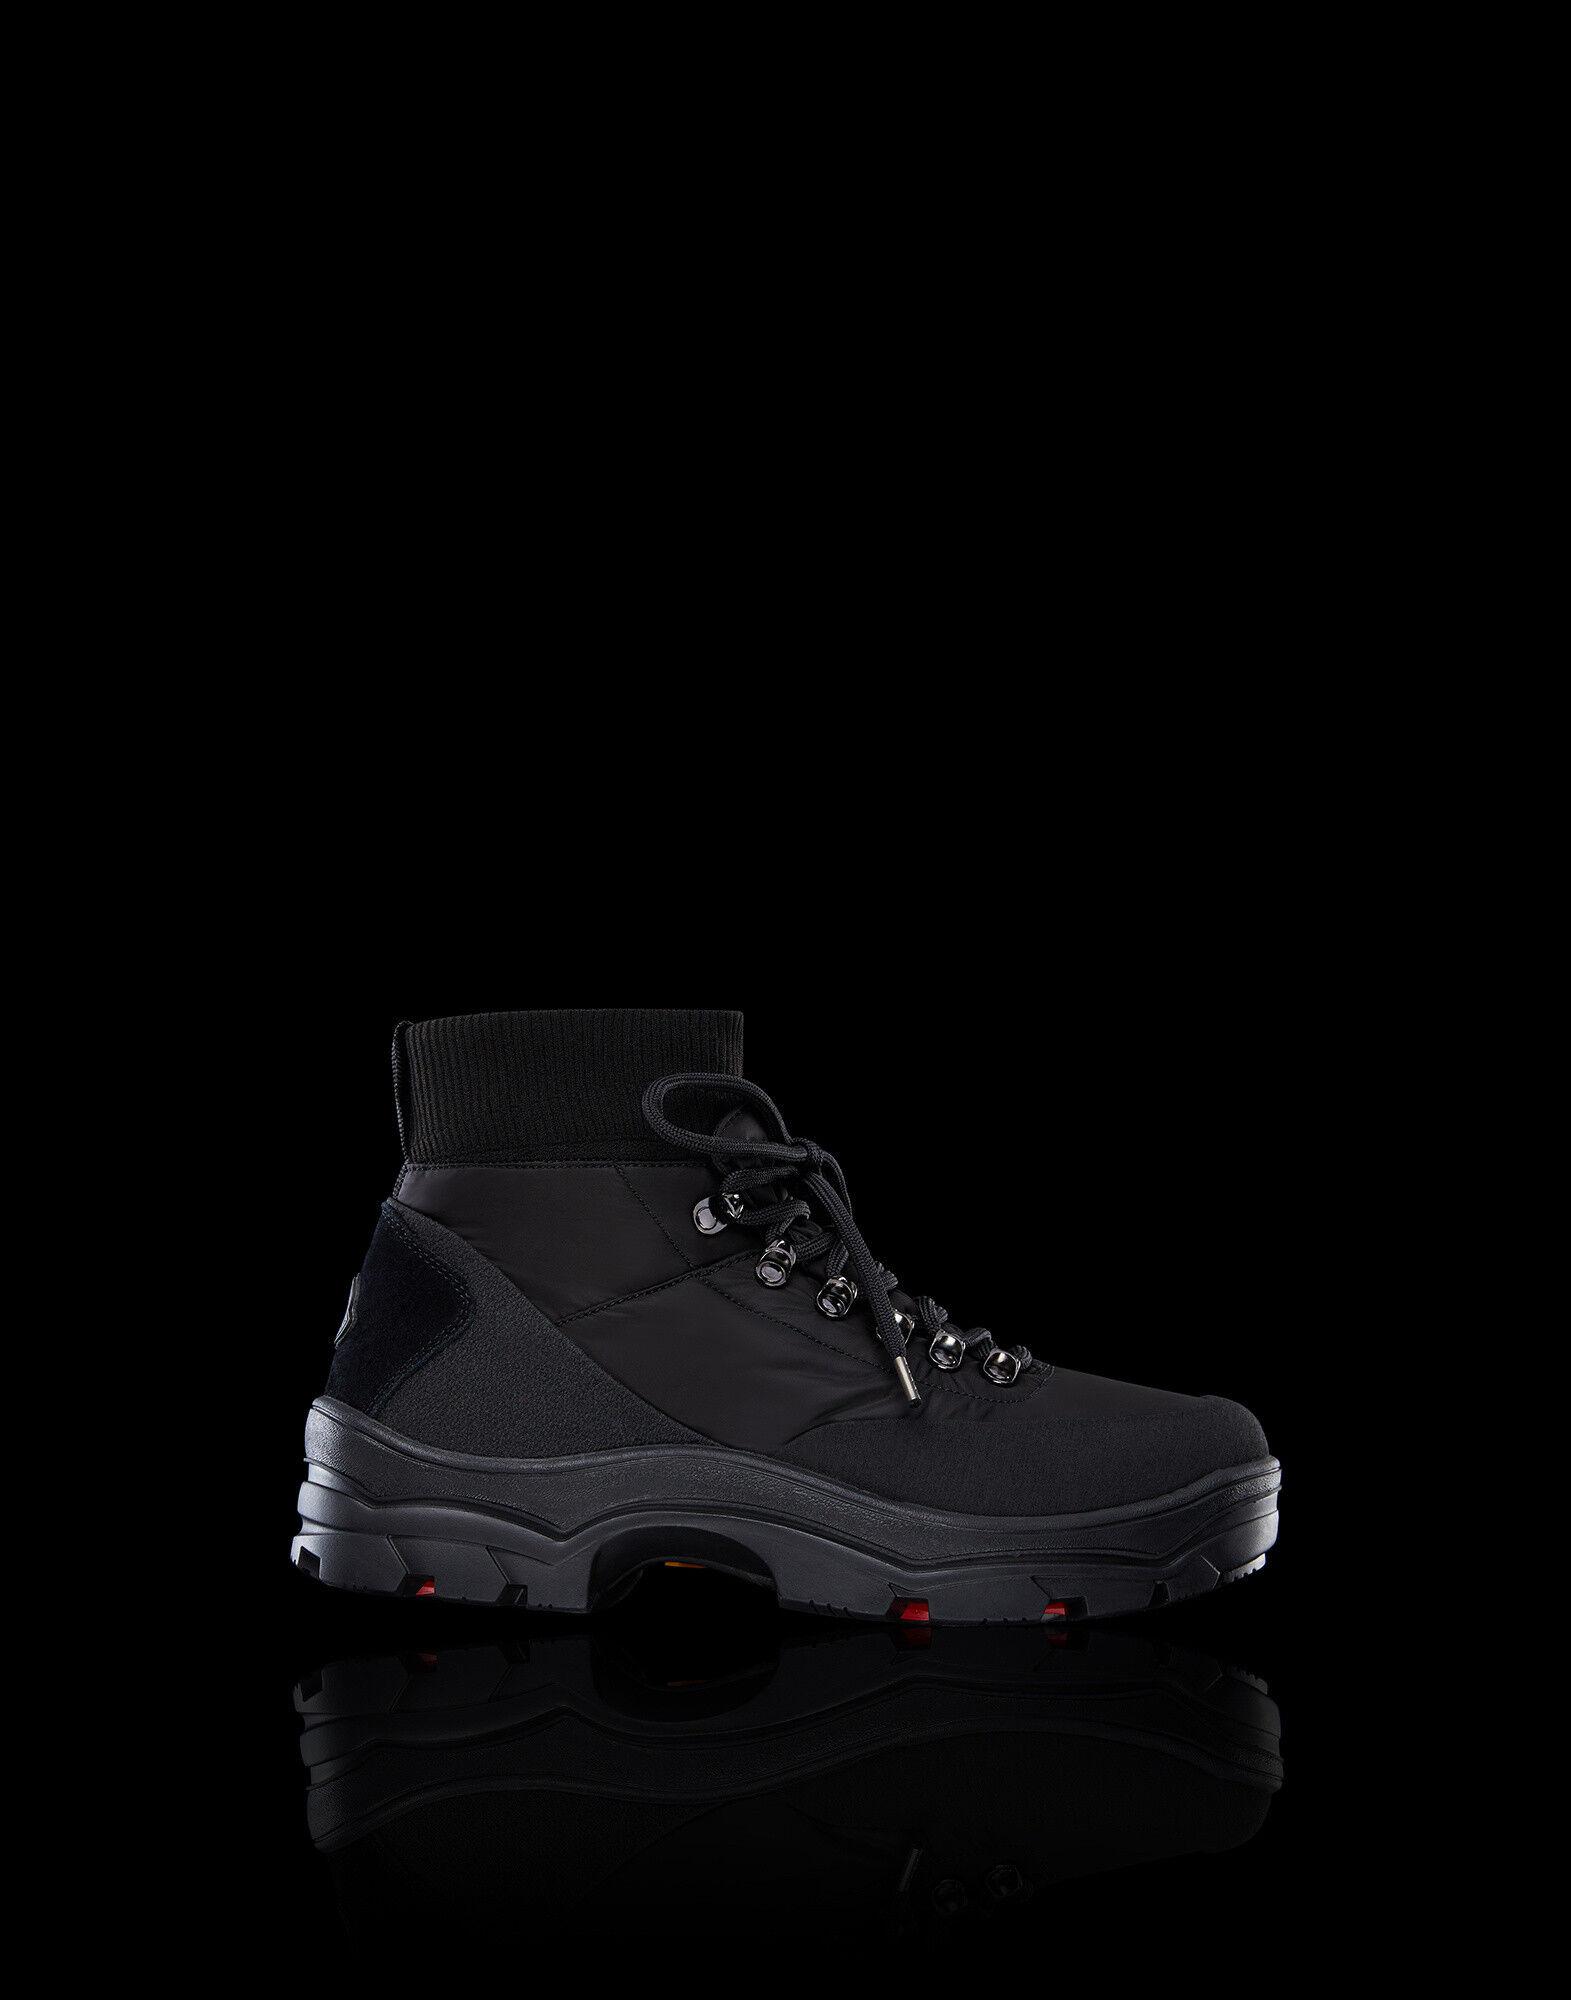 Boots - Men - FW Collection | Moncler